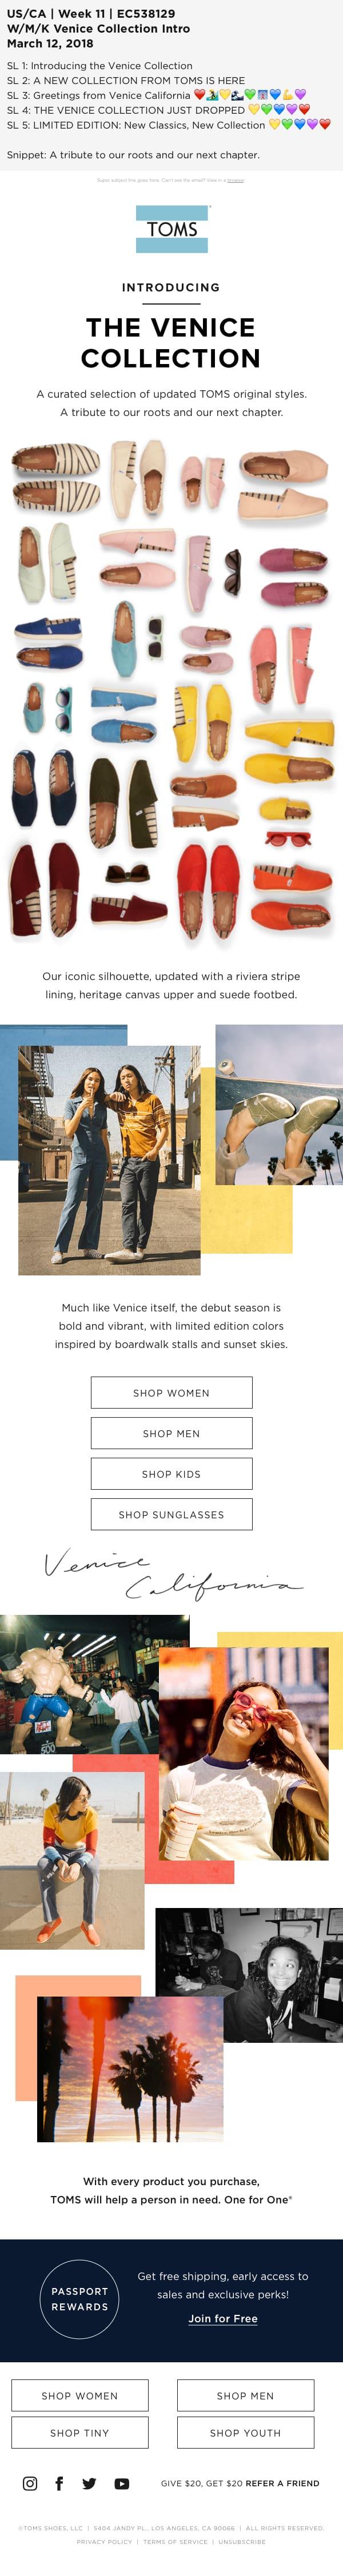 Wk11-VeniceCollection-EC538129.jpg